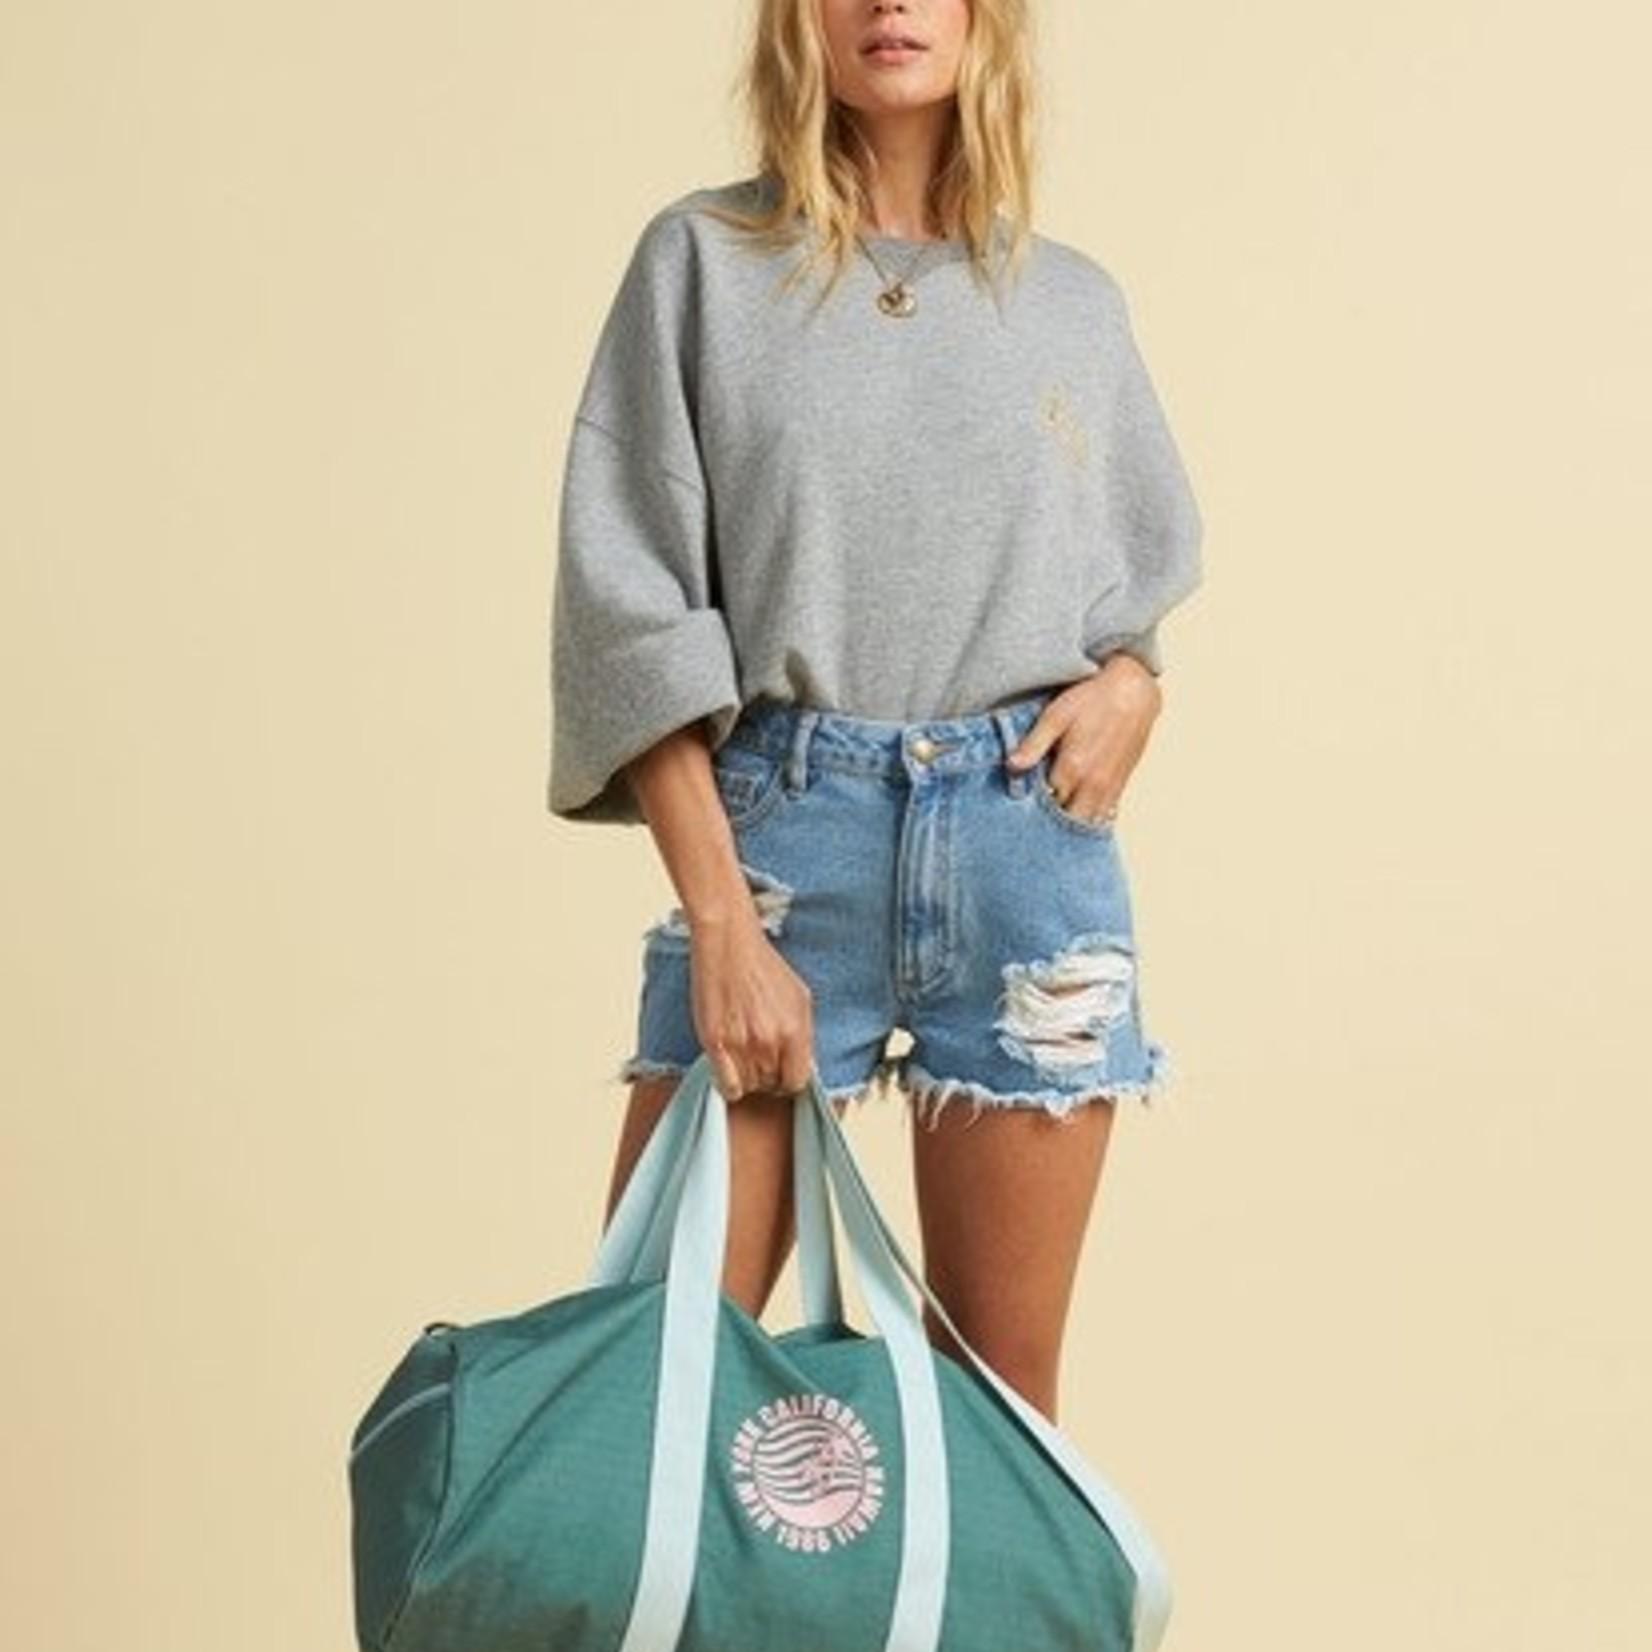 Billabong Billabong x Salty Blonde Stay Salty Weekender Bag